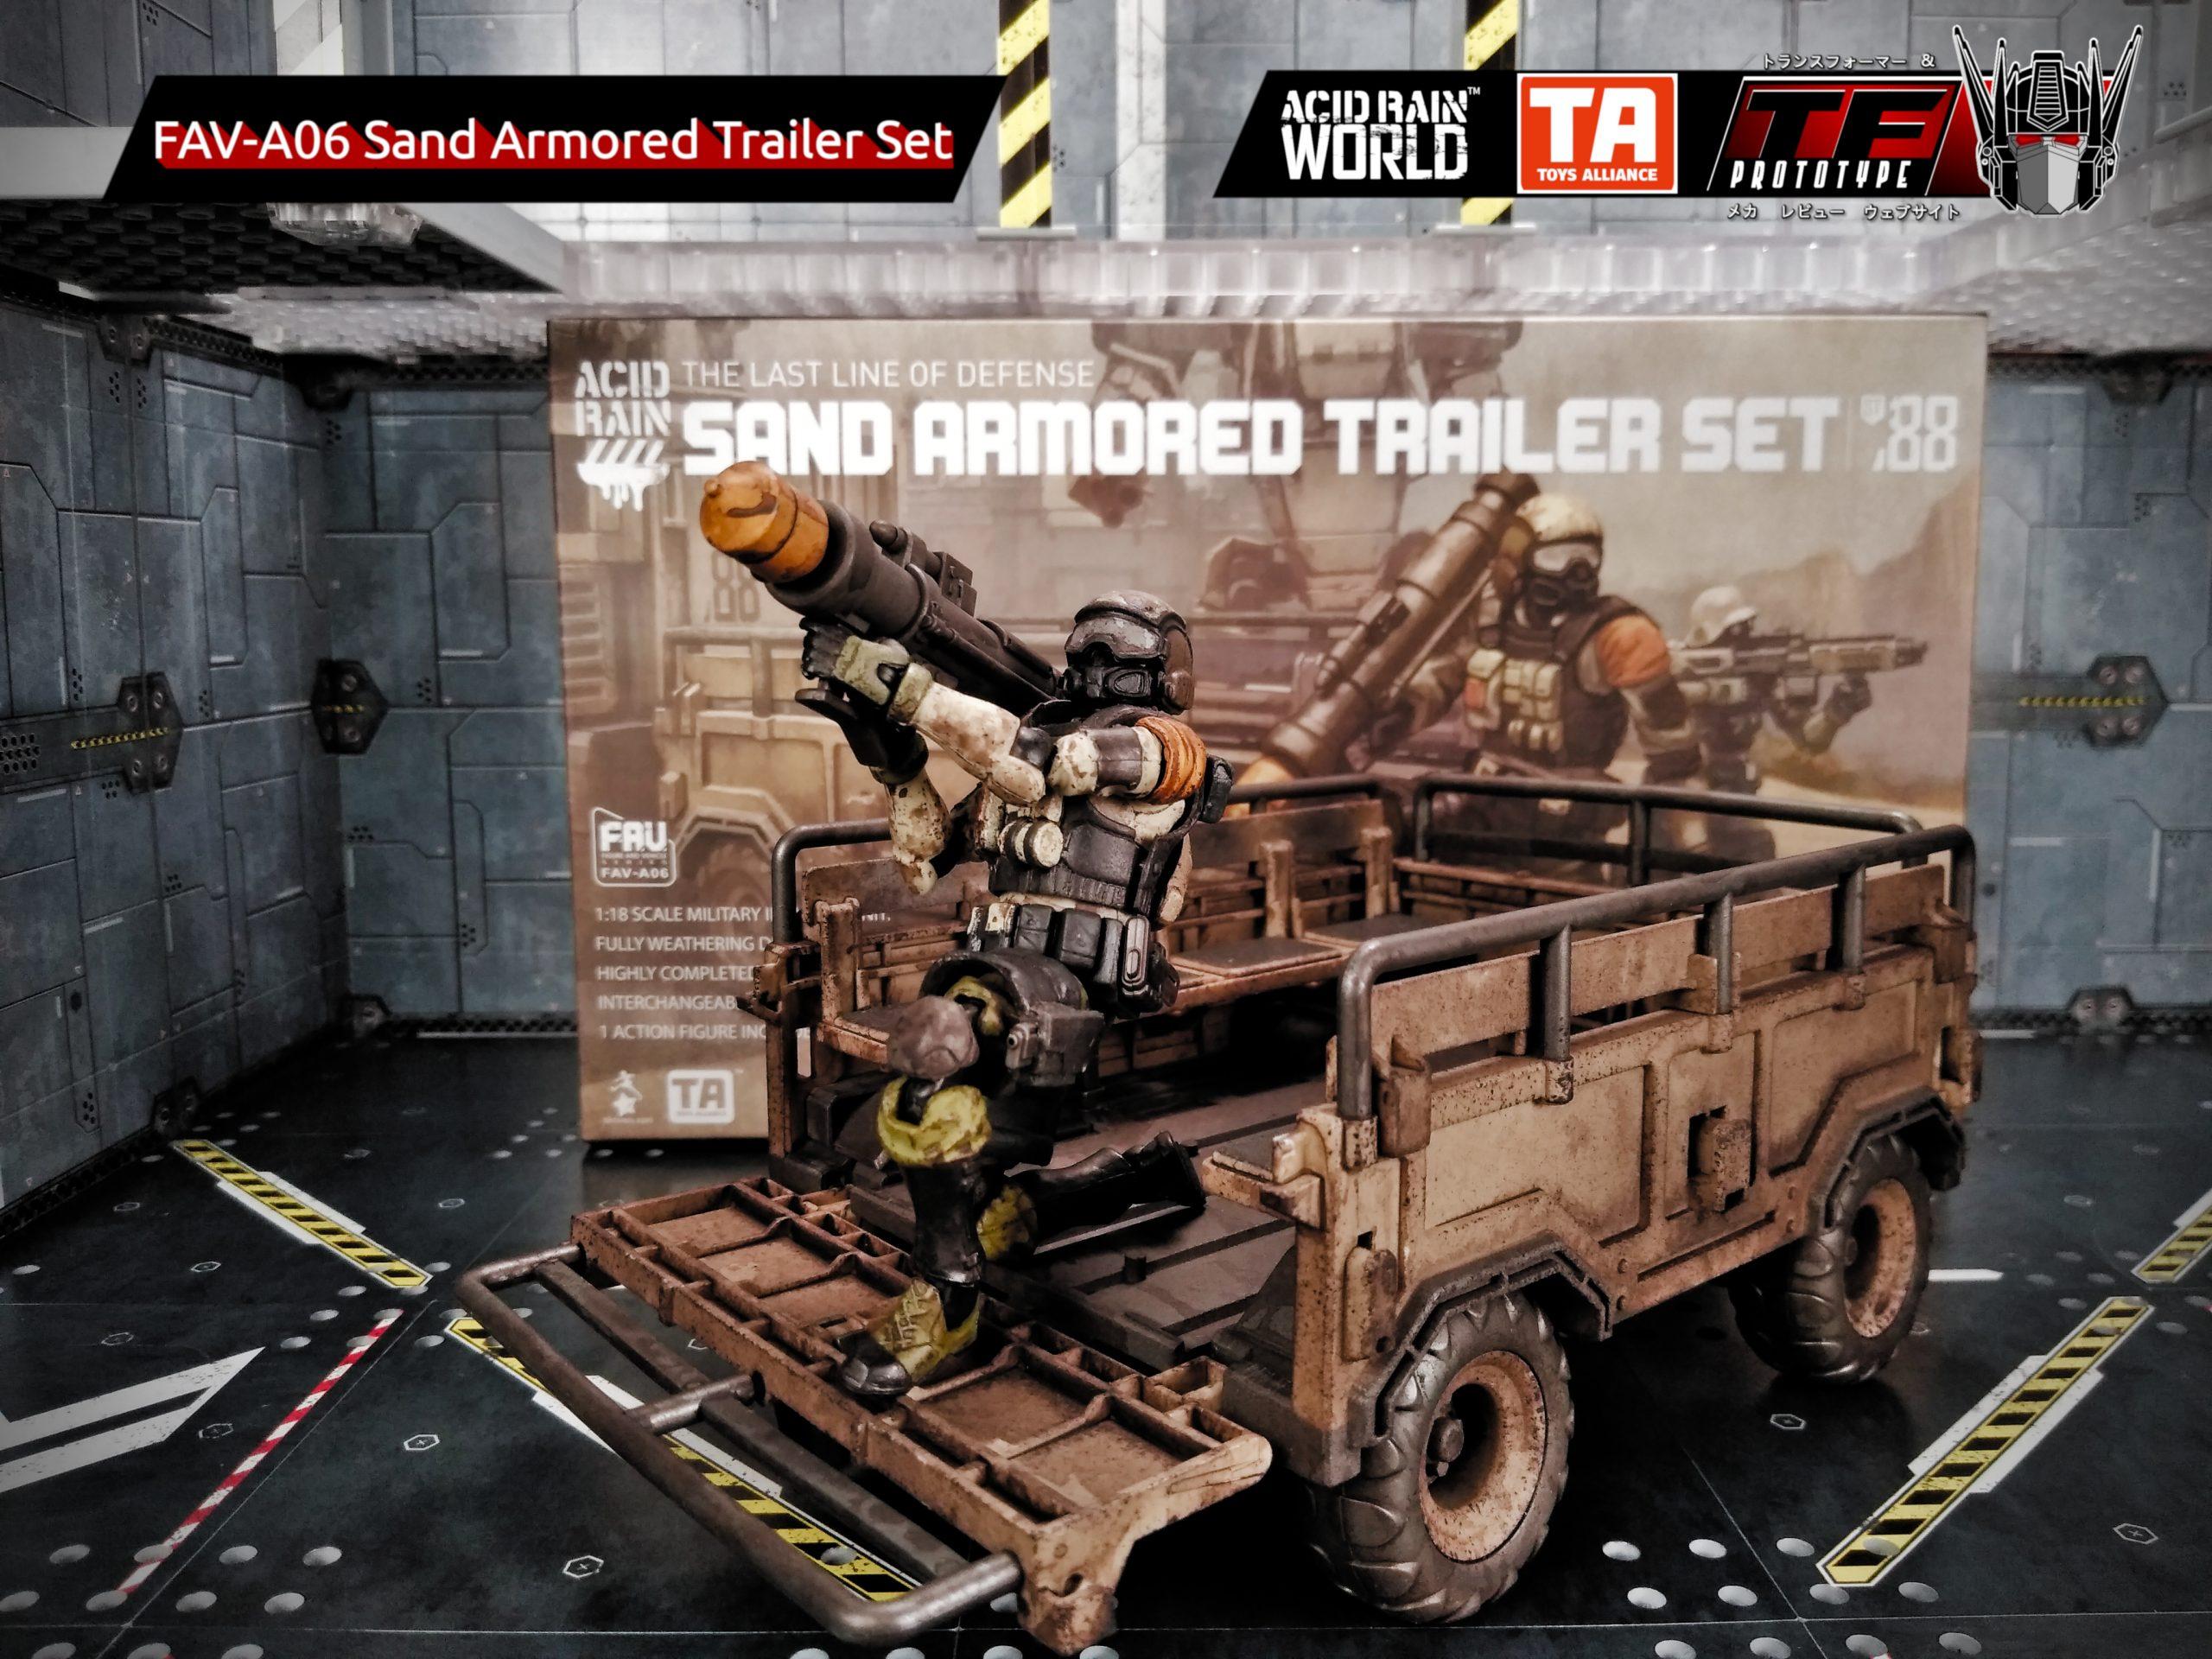 Acid Rain World Toys Alliance FAV-A06 Sand Armored Trailer figure Set ST88 /_US